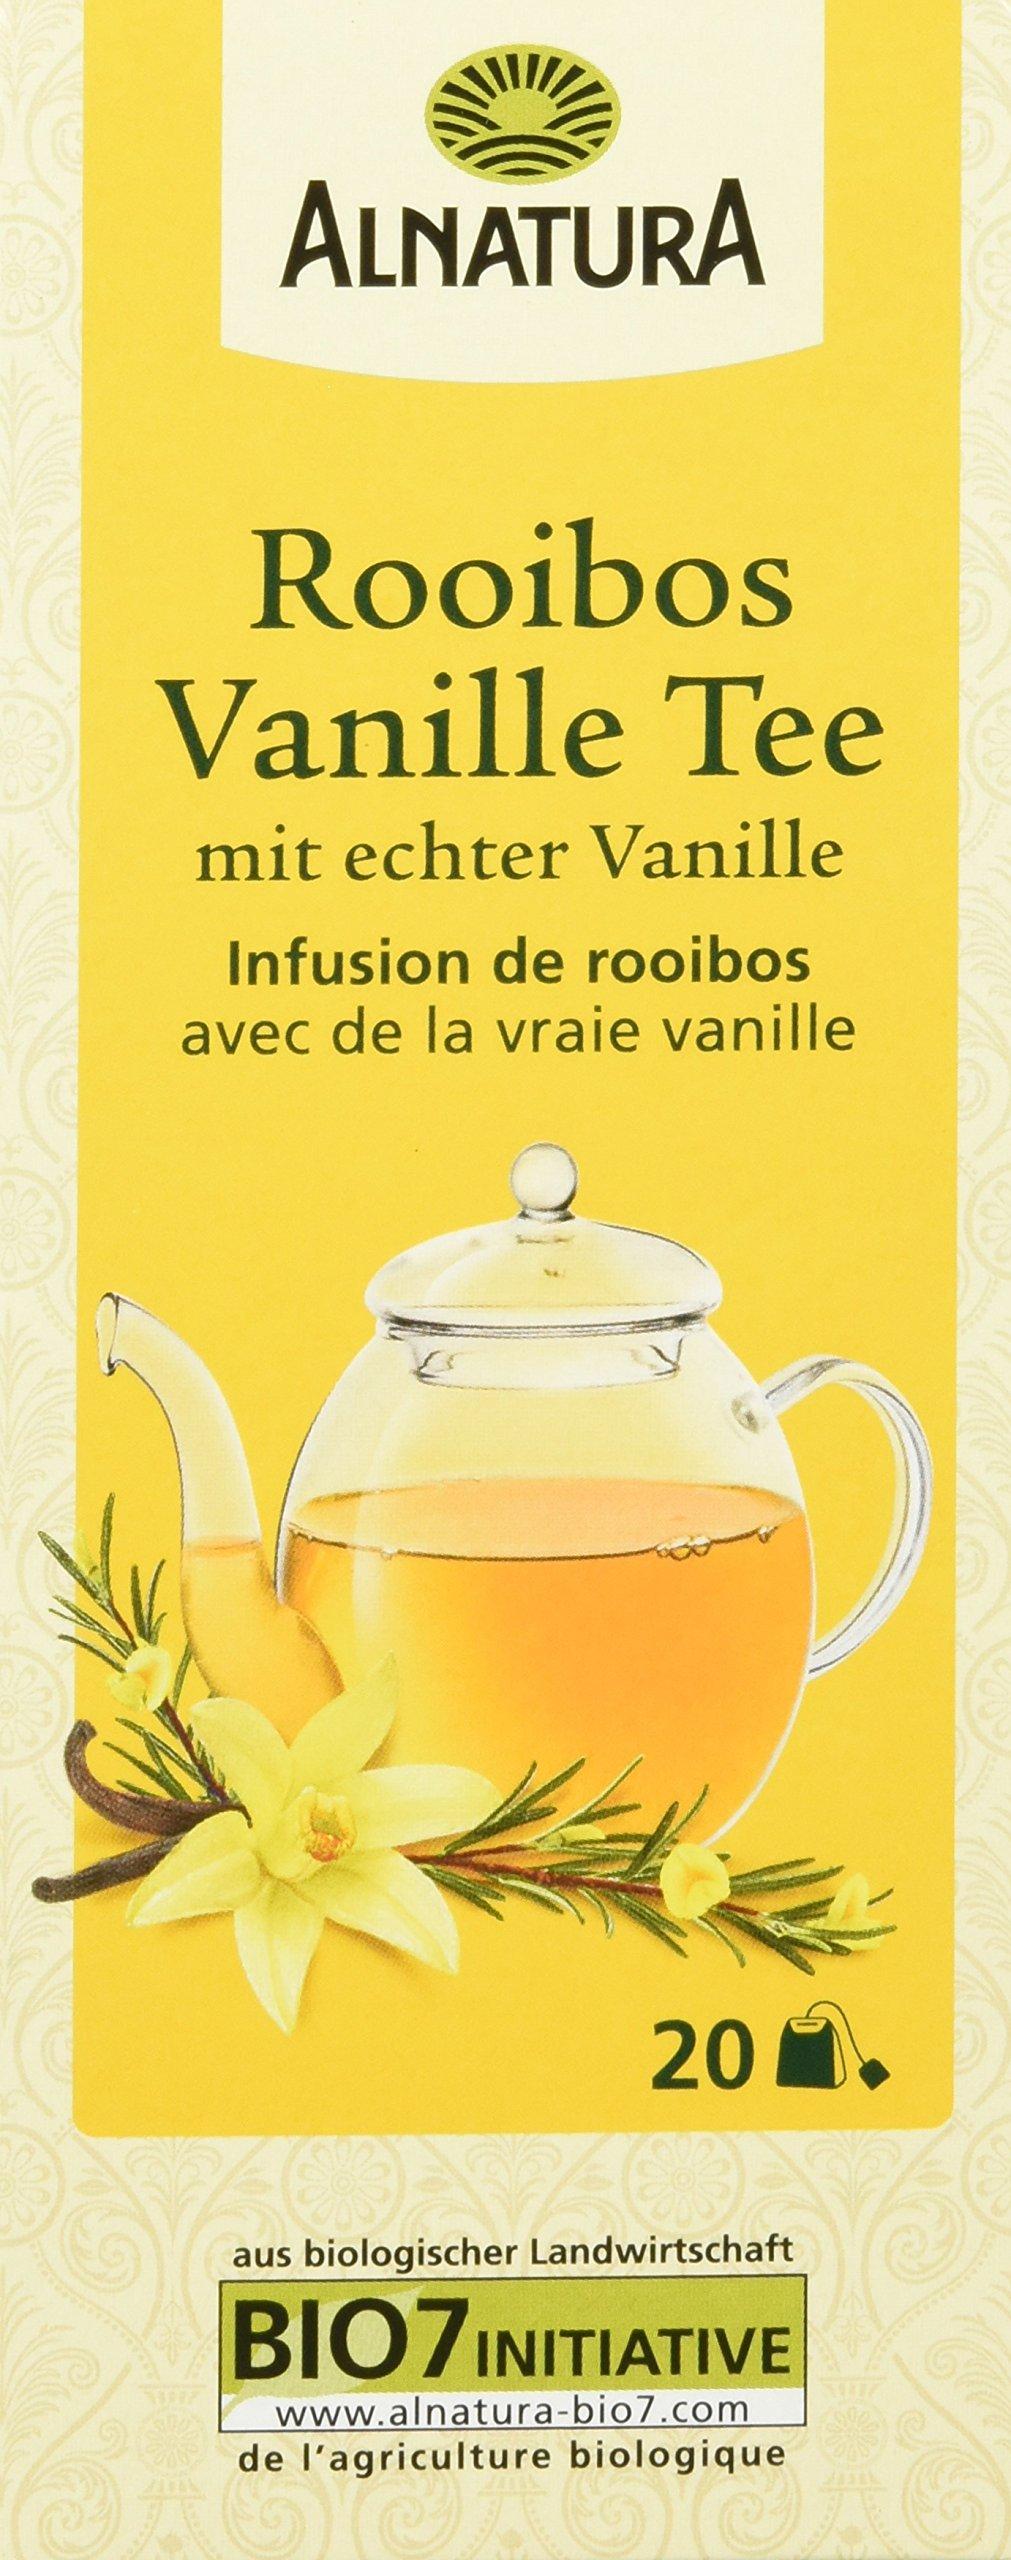 Alnatura-Bio-Rooibos-Vanille-Tee-mit-echter-Vanille-20-Beutel-30-g